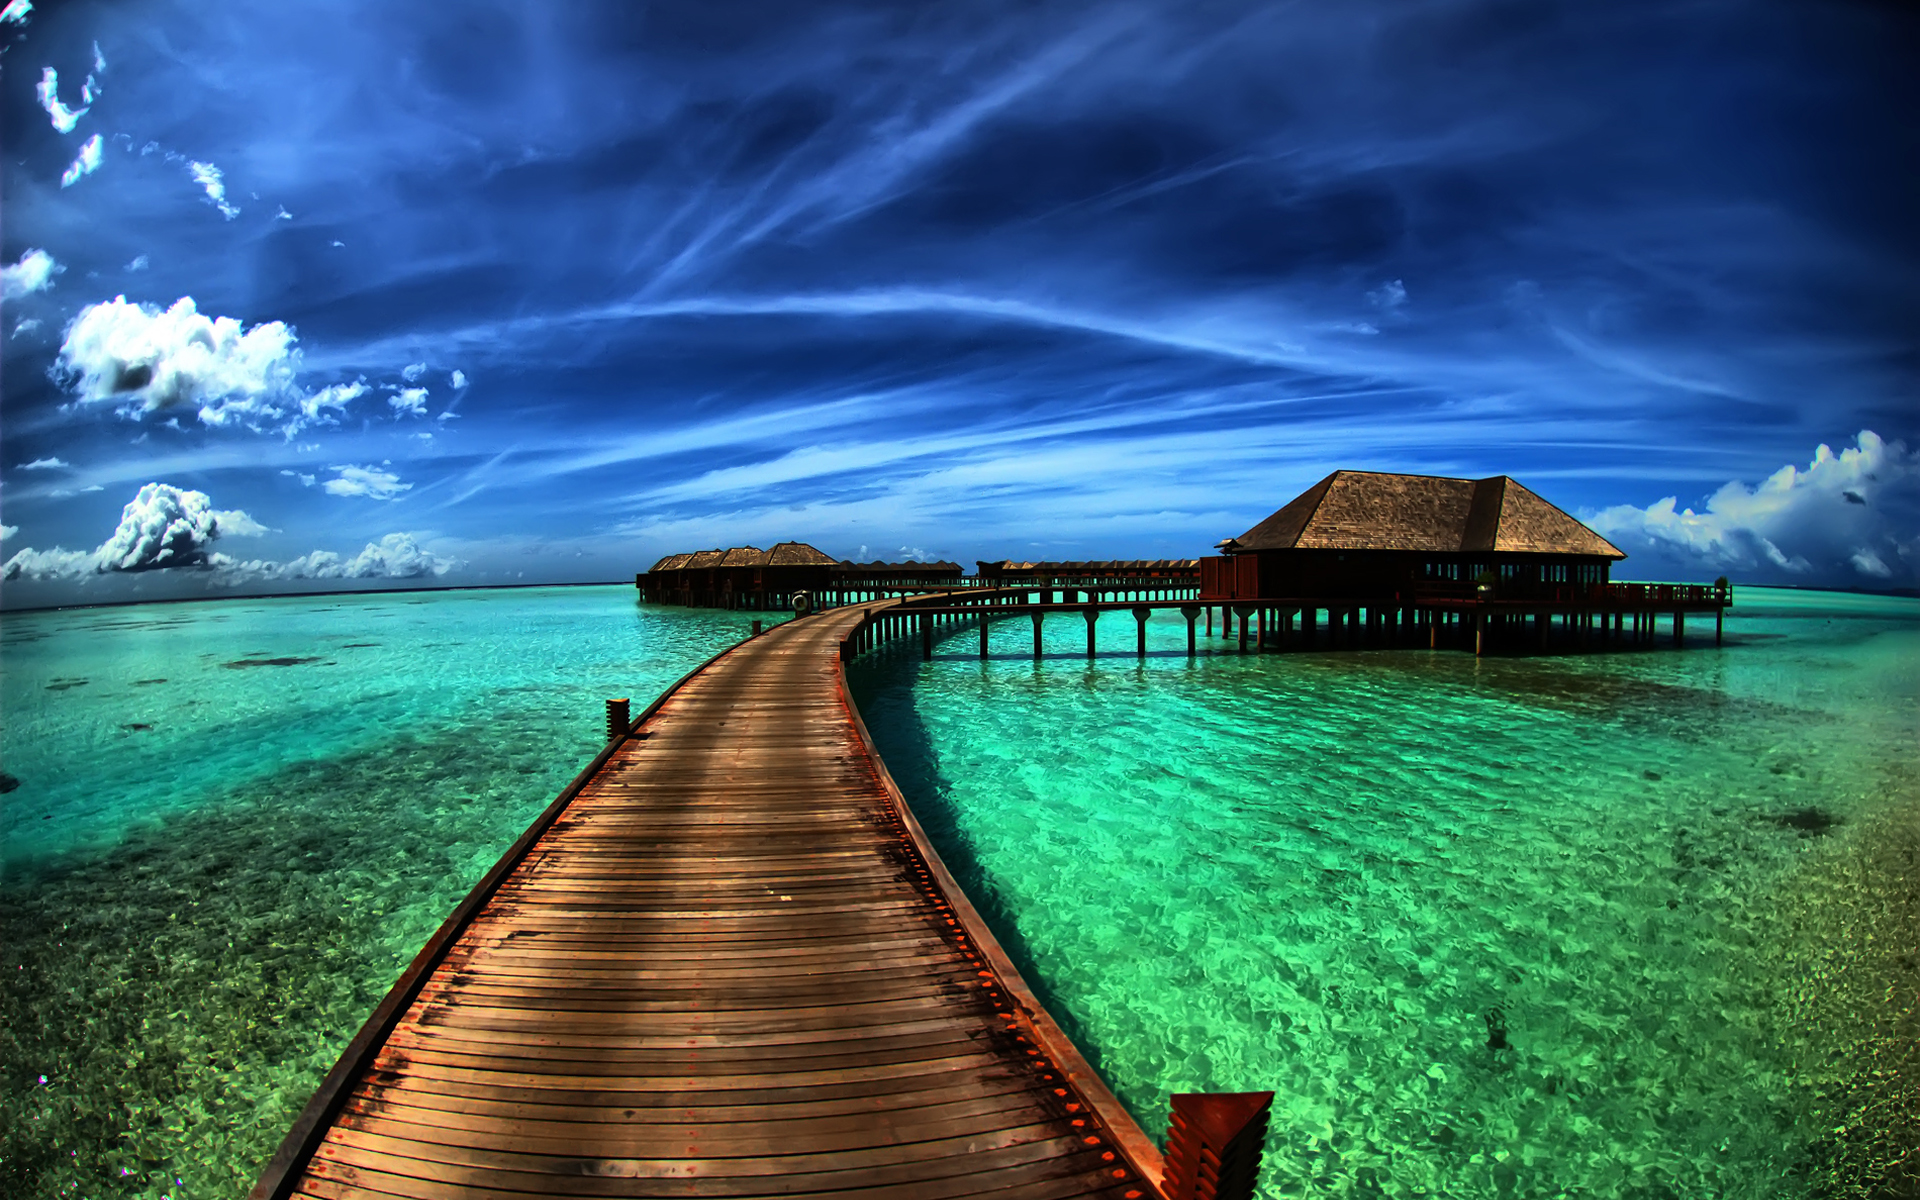 30 HD Tropical Beach Backgrounds 1920x1200